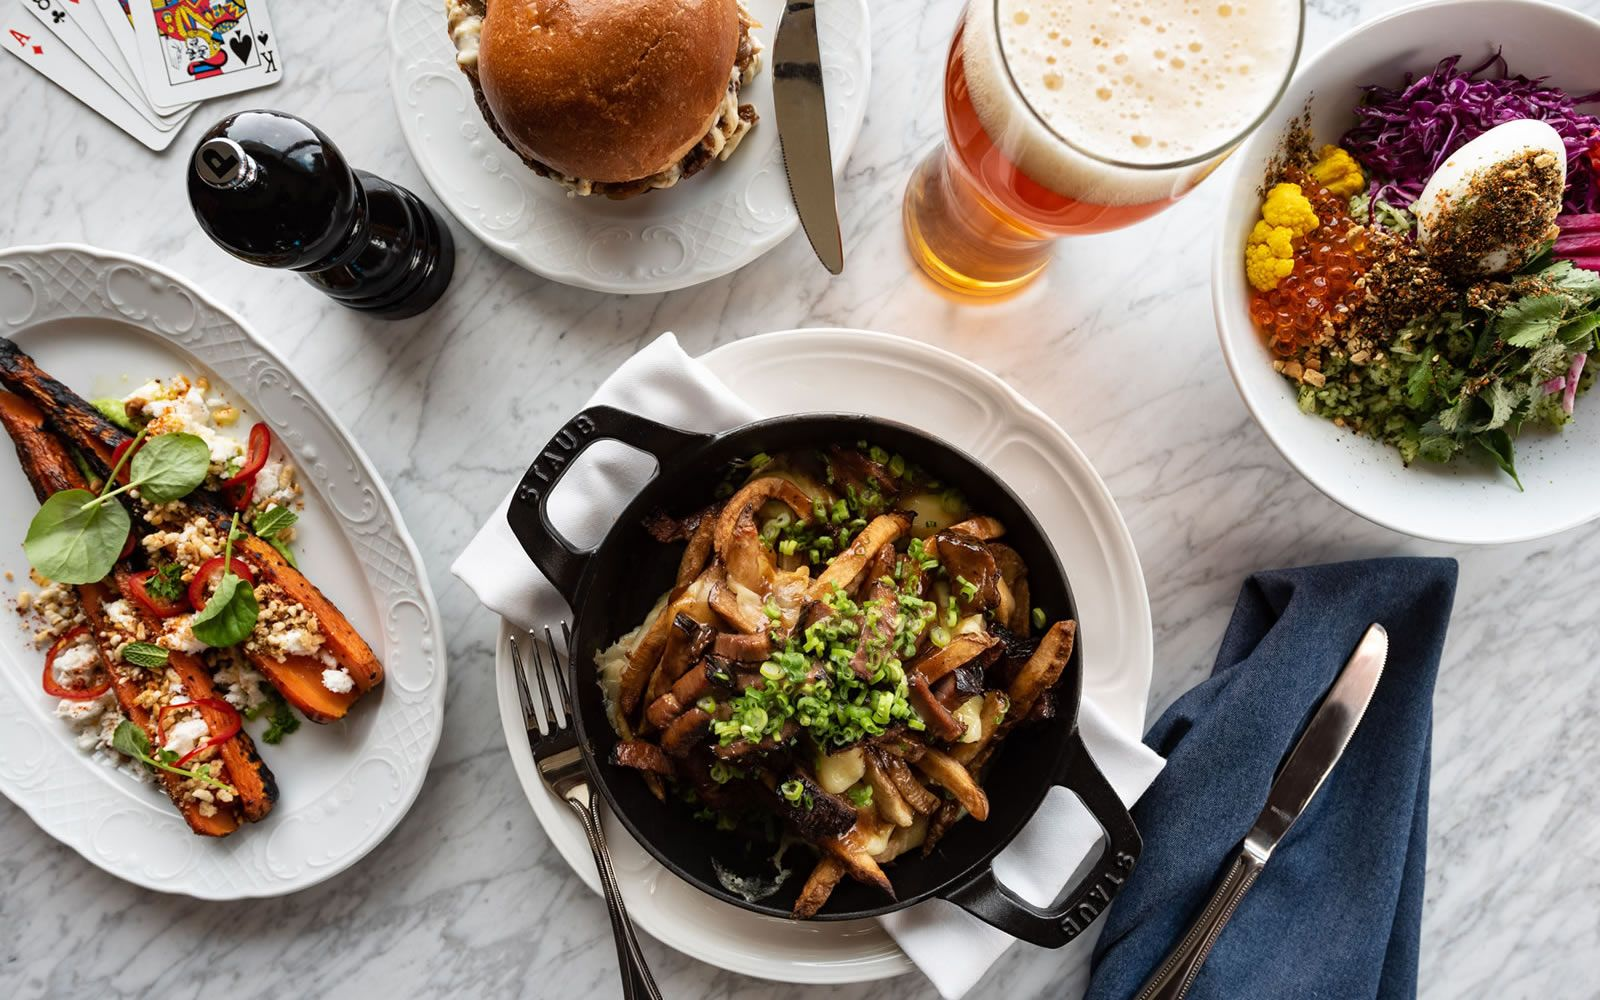 Downtown Ben Paris Restaurant near Pike Place Market